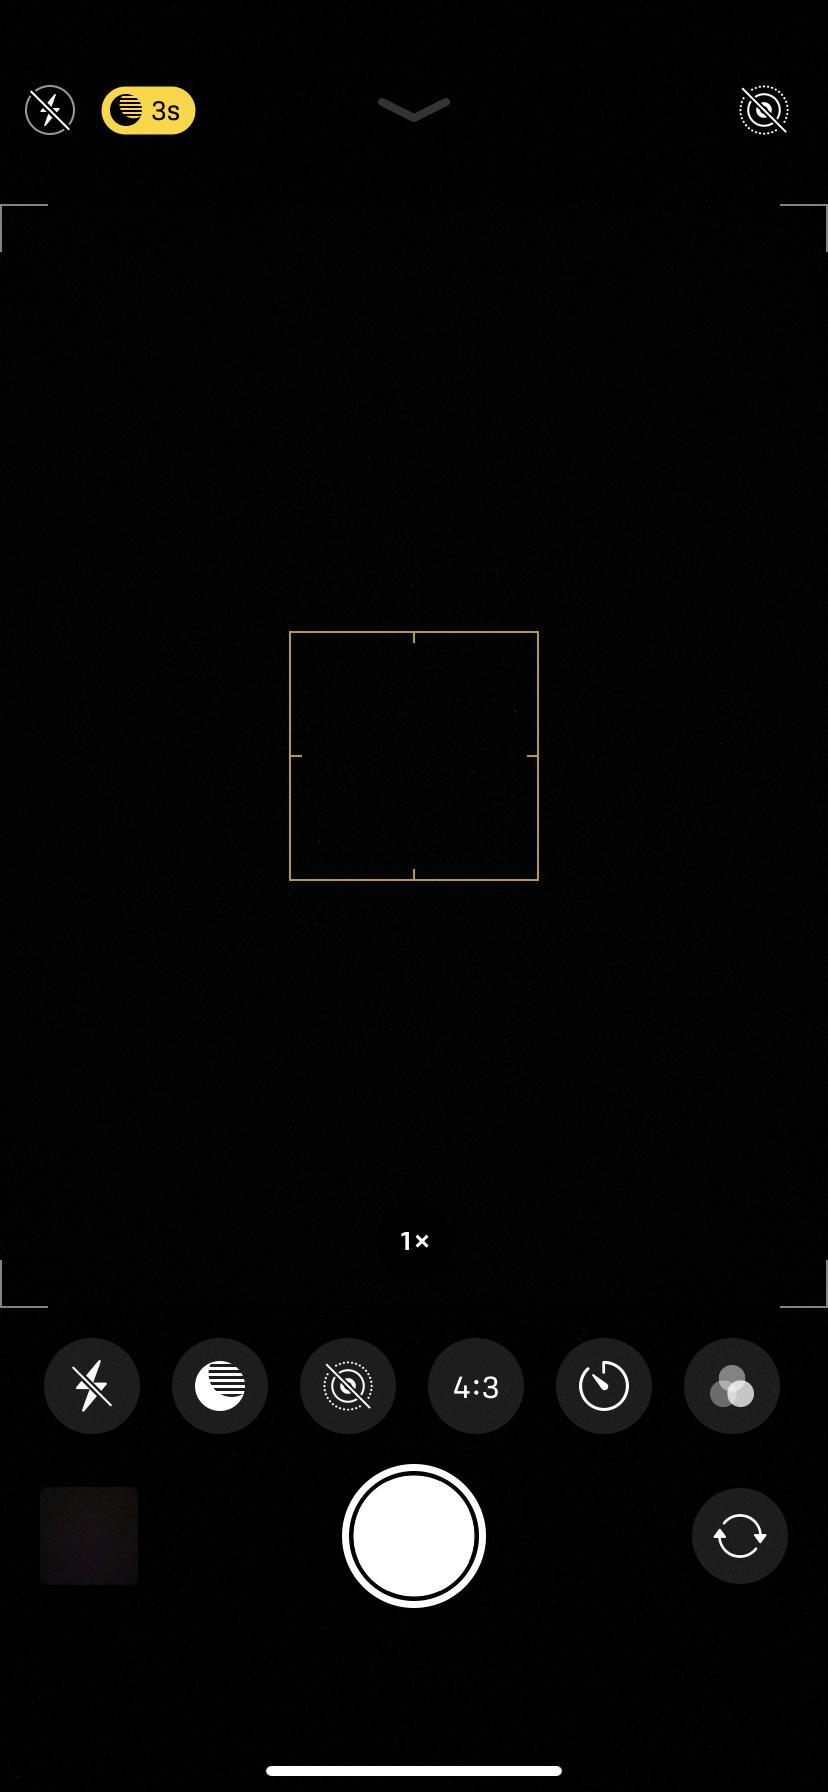 Iphone 11 Pro Flash Modes Missing Apple Community